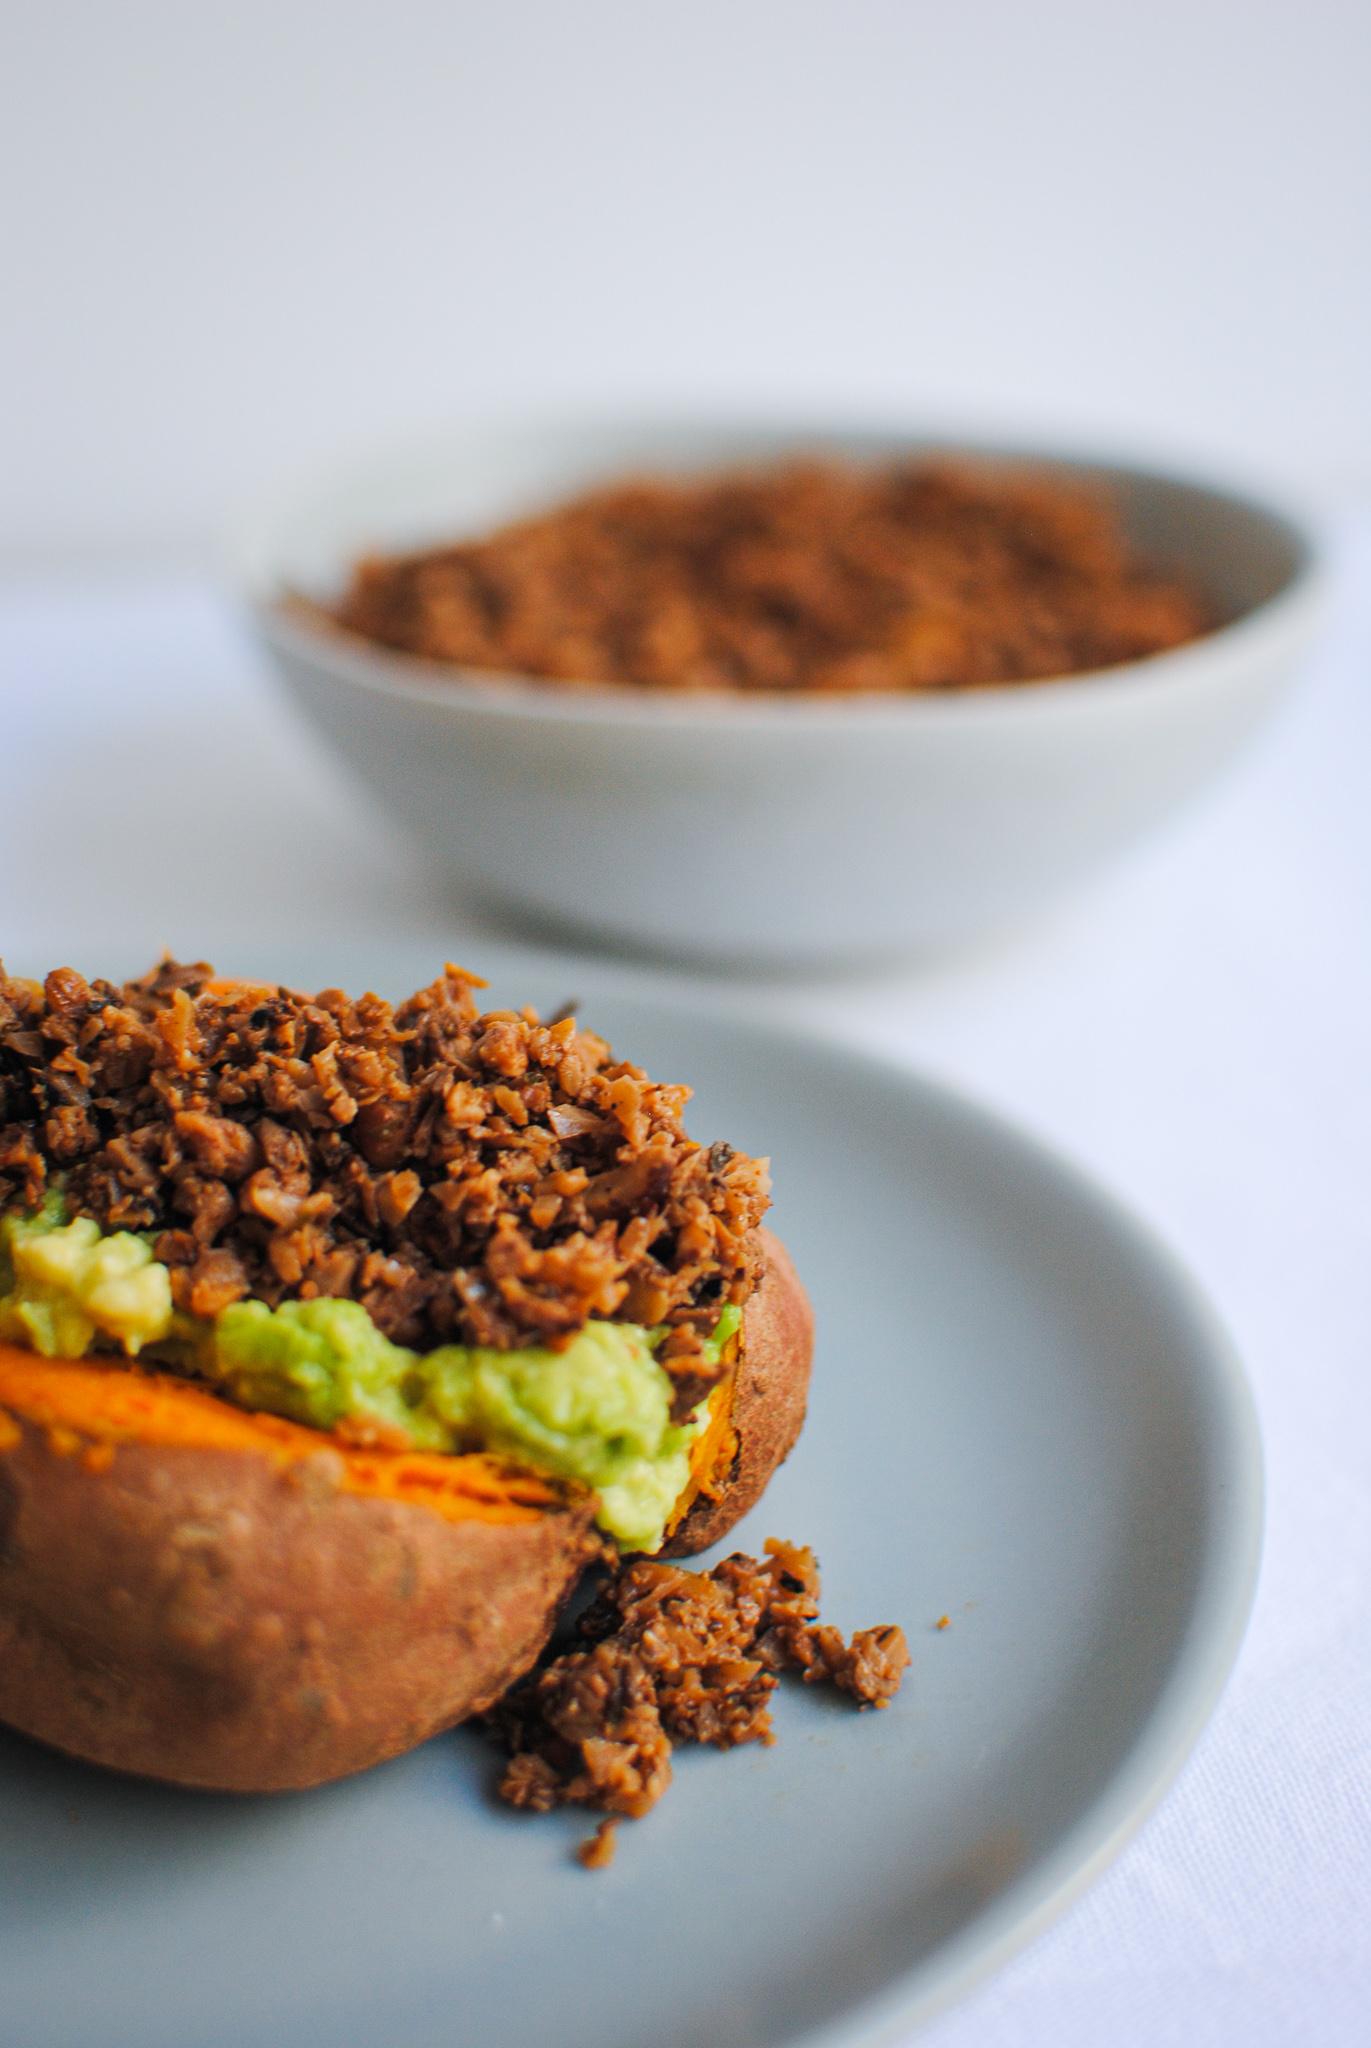 picadinho vegan delicioso | please consider | joana limao